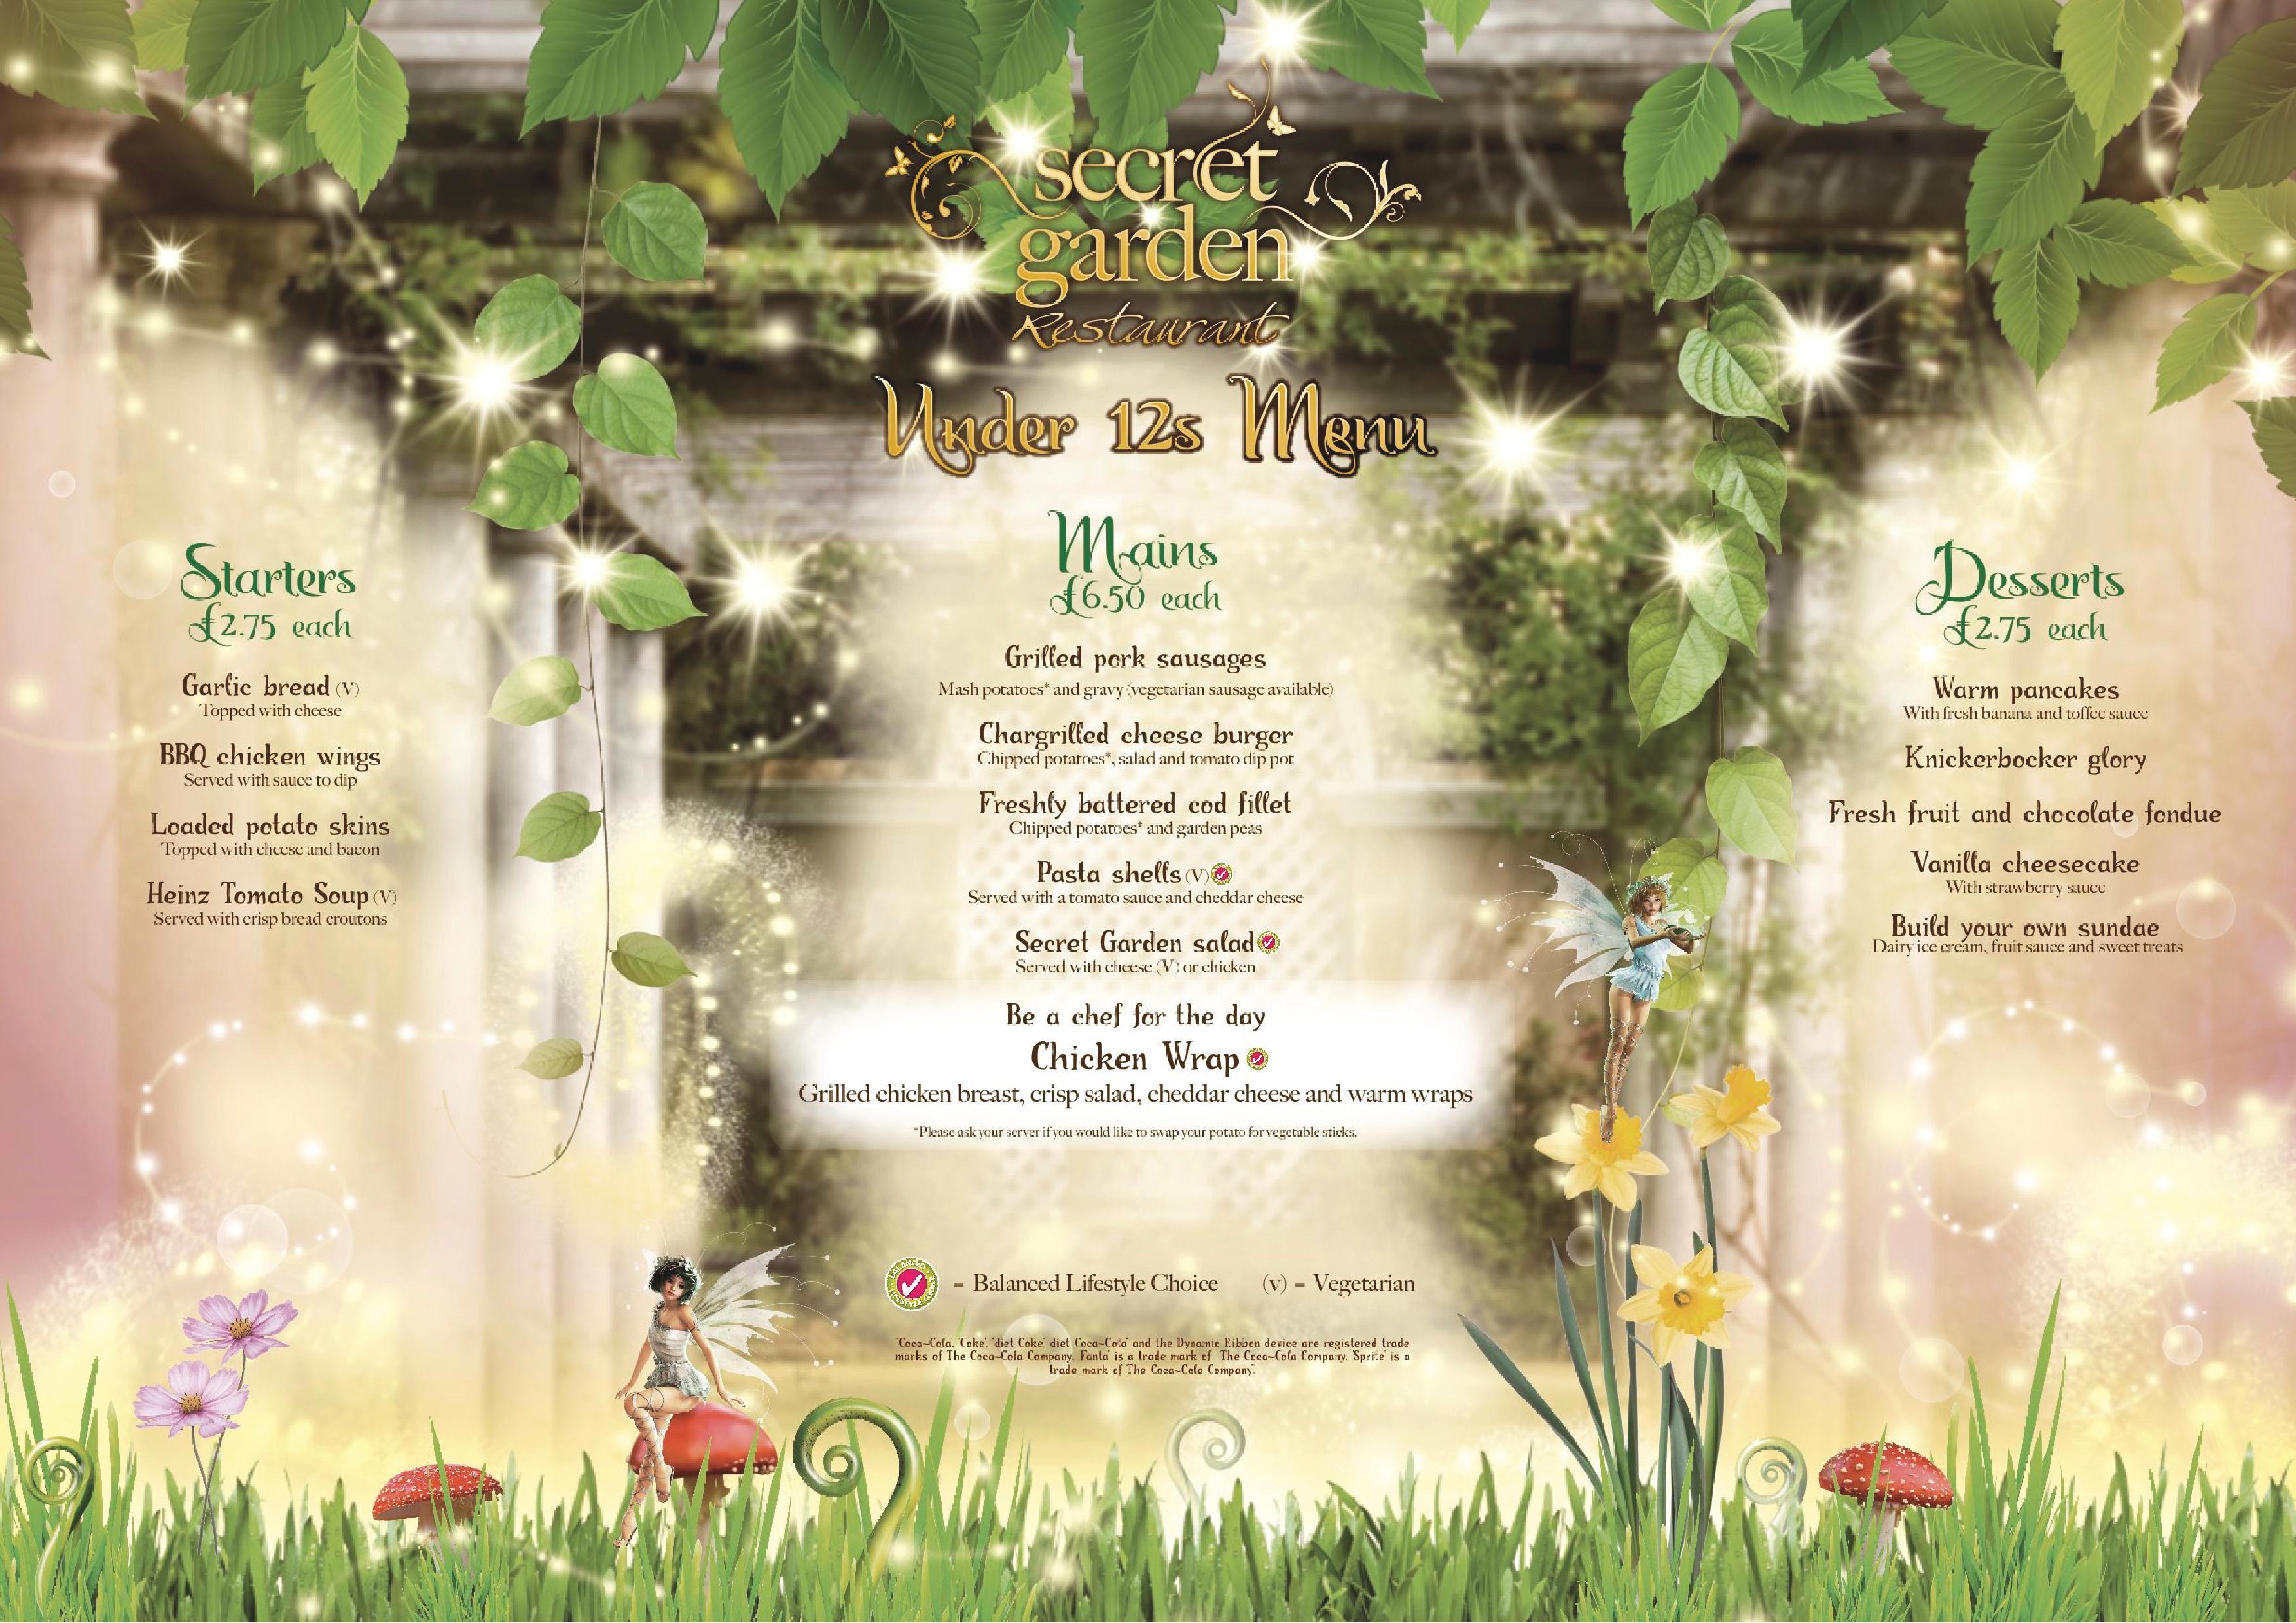 Secret Garden Restaurant Alton Towers Menu